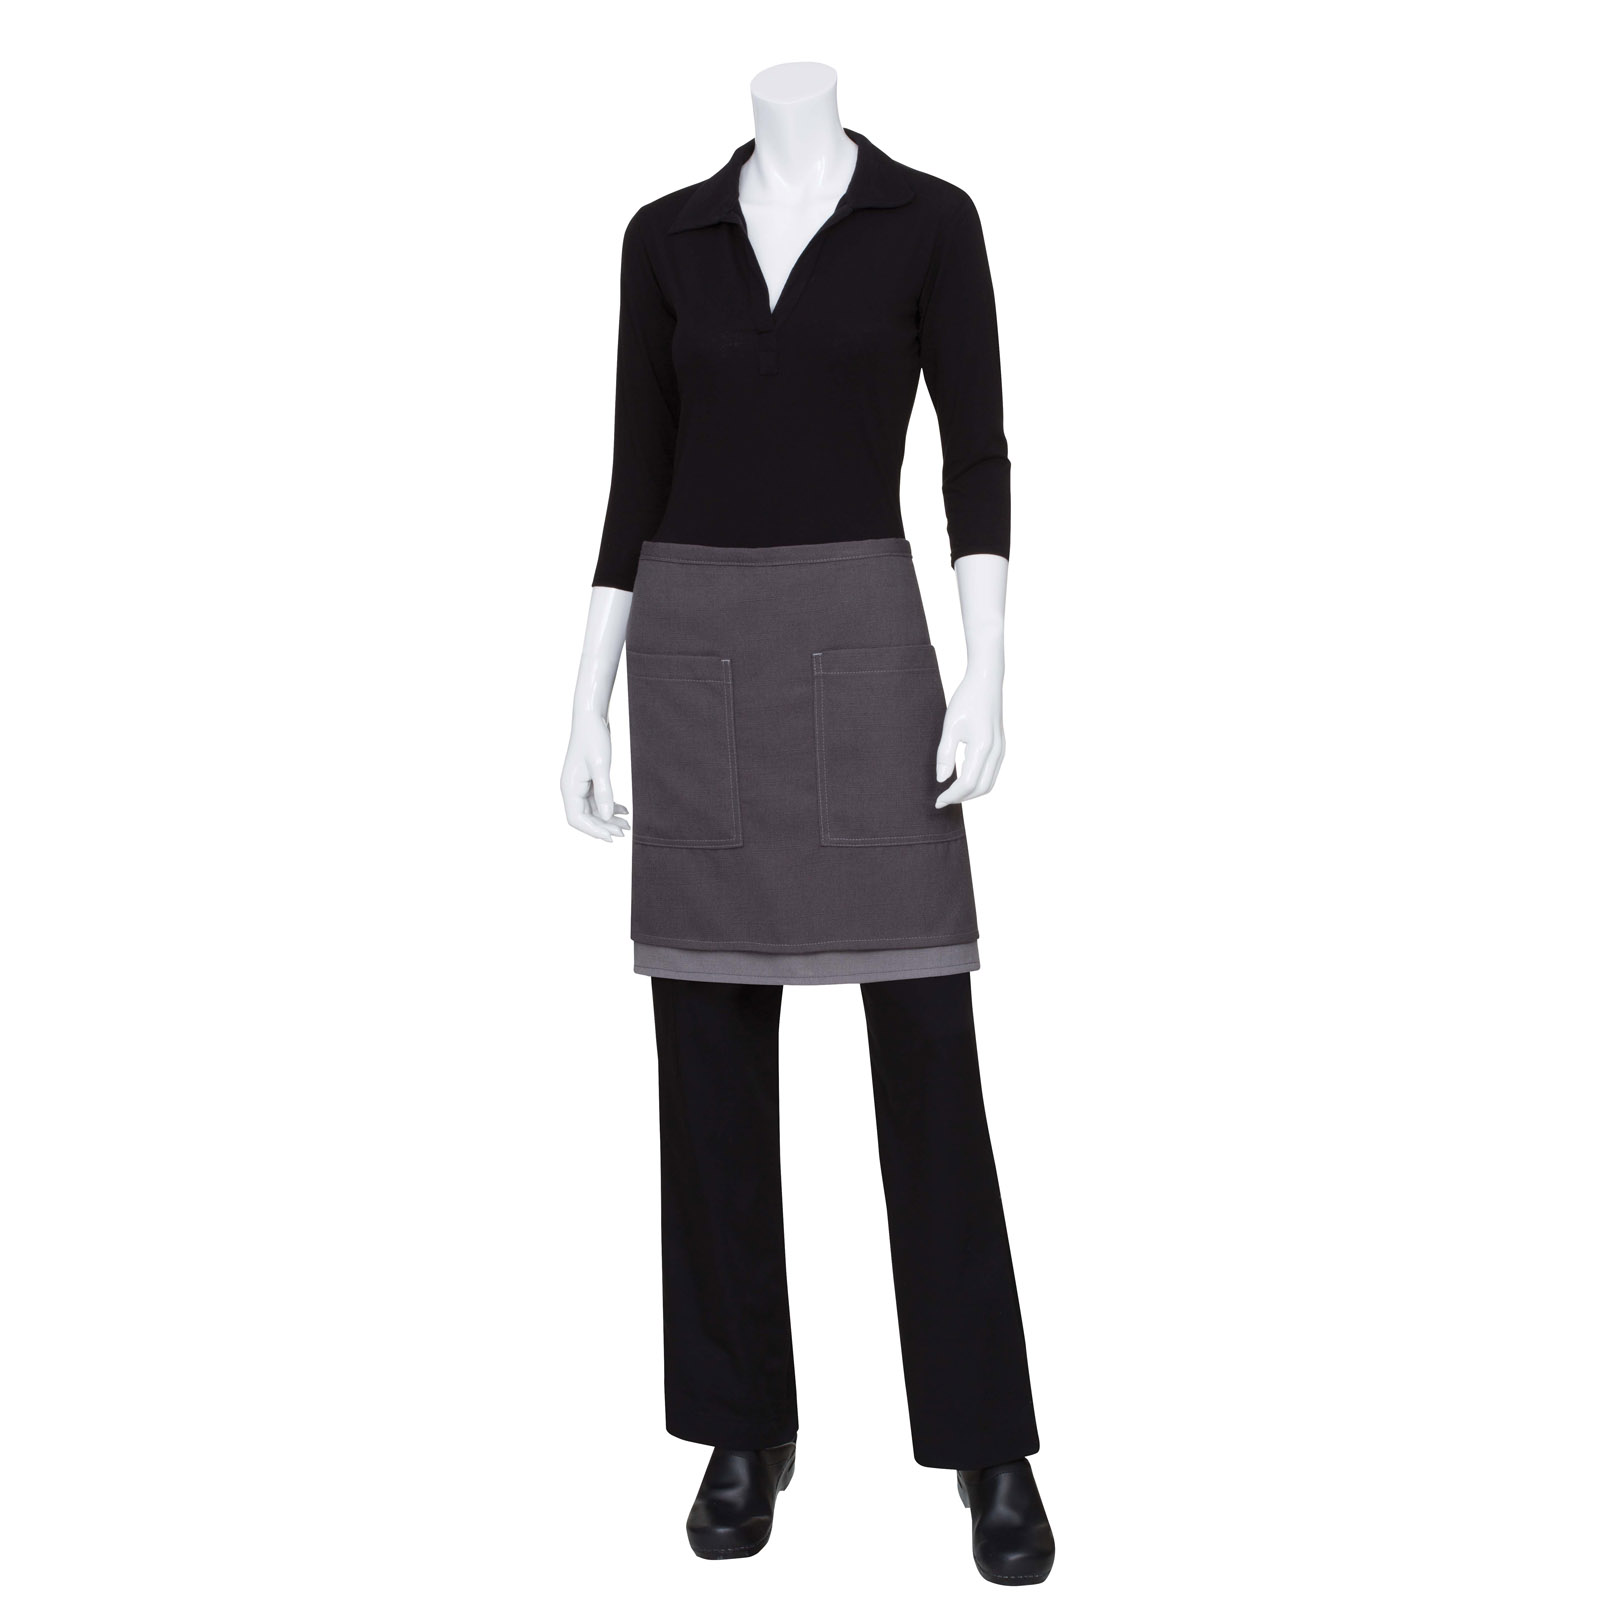 Chef Works ASCW12GGY0 waist apron